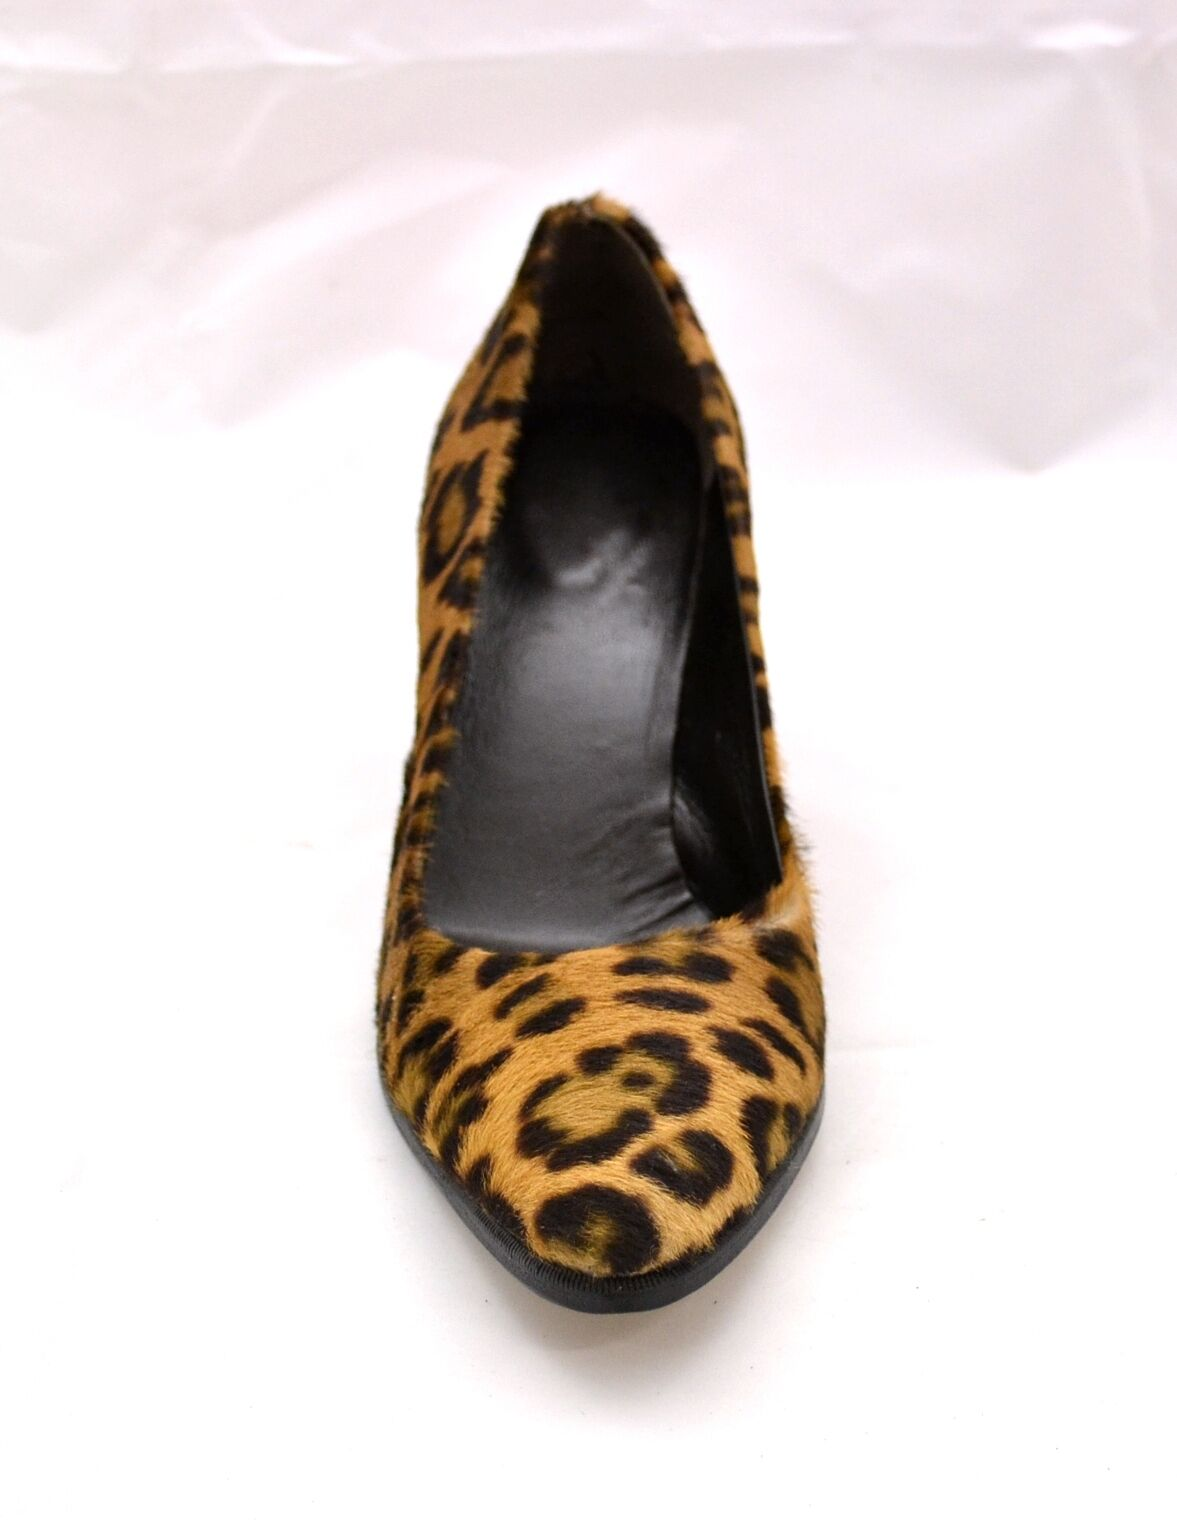 Schuhe Damens VERA DECOLLETE' ARTIGIANALI VERA Damens PELLE CAVALLINO MACULATO MADE IN ITALY 40513b